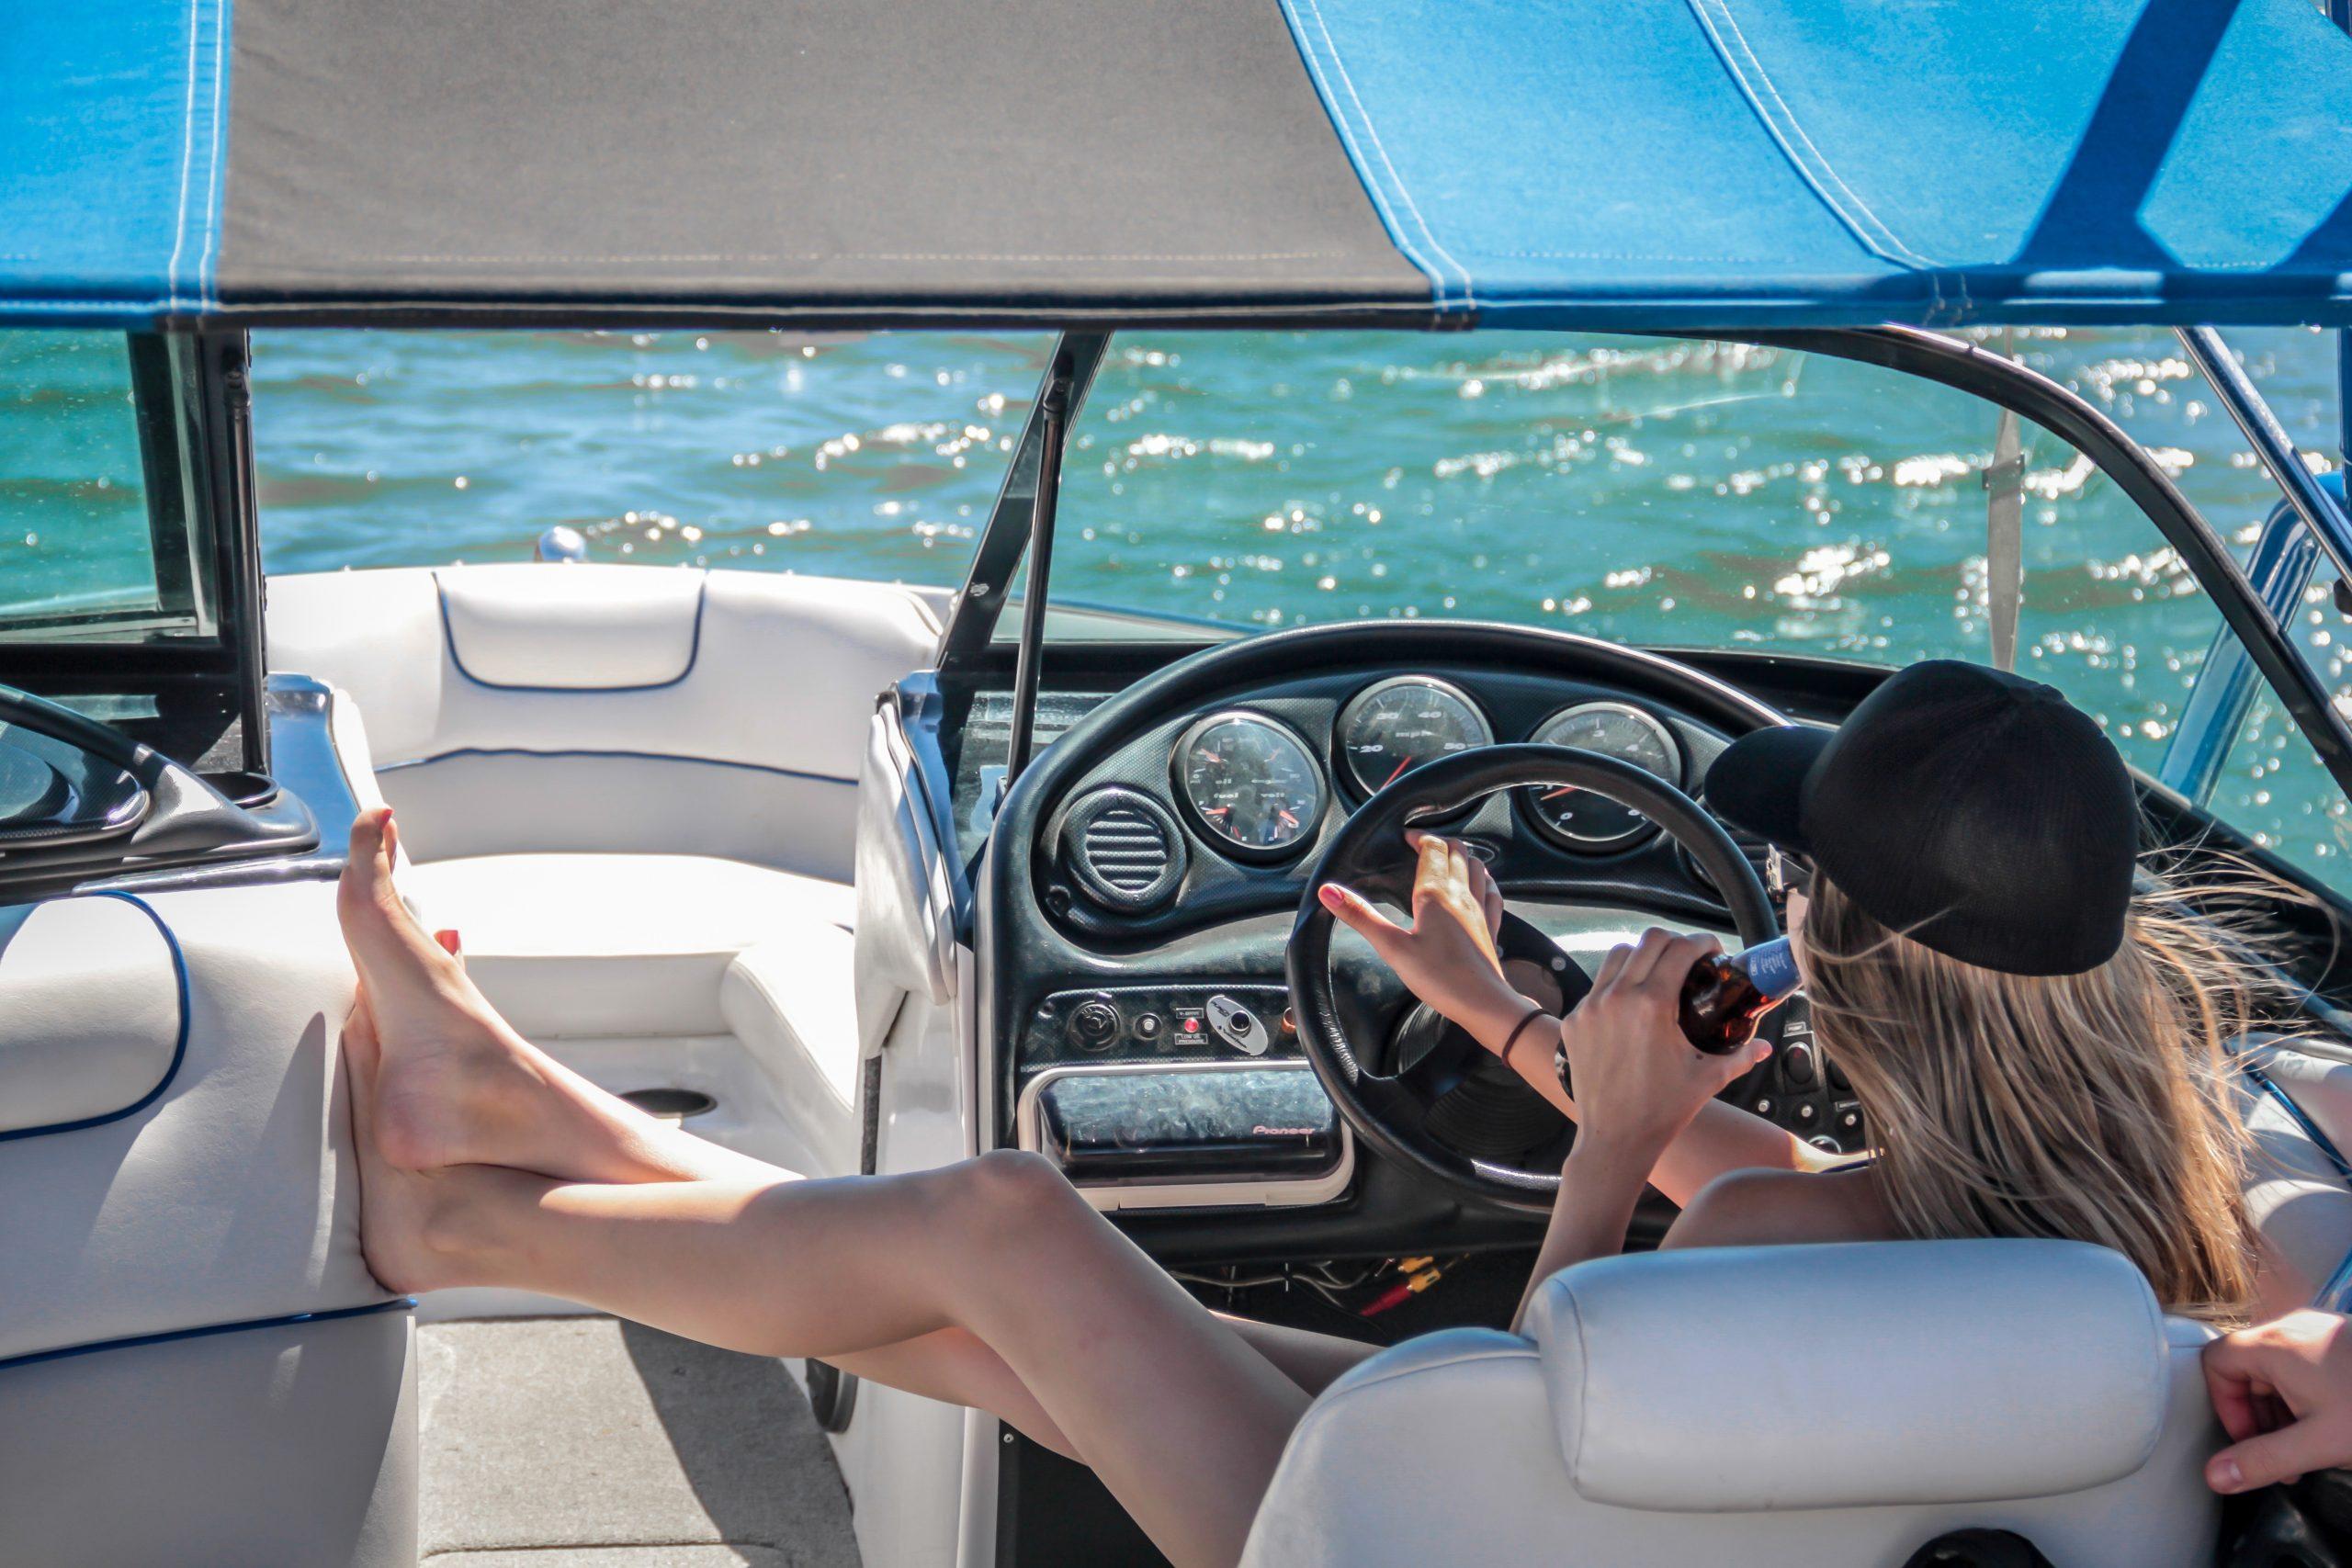 woman-wearing-black-cap-holding-bottle-on-white-speedboat-209978